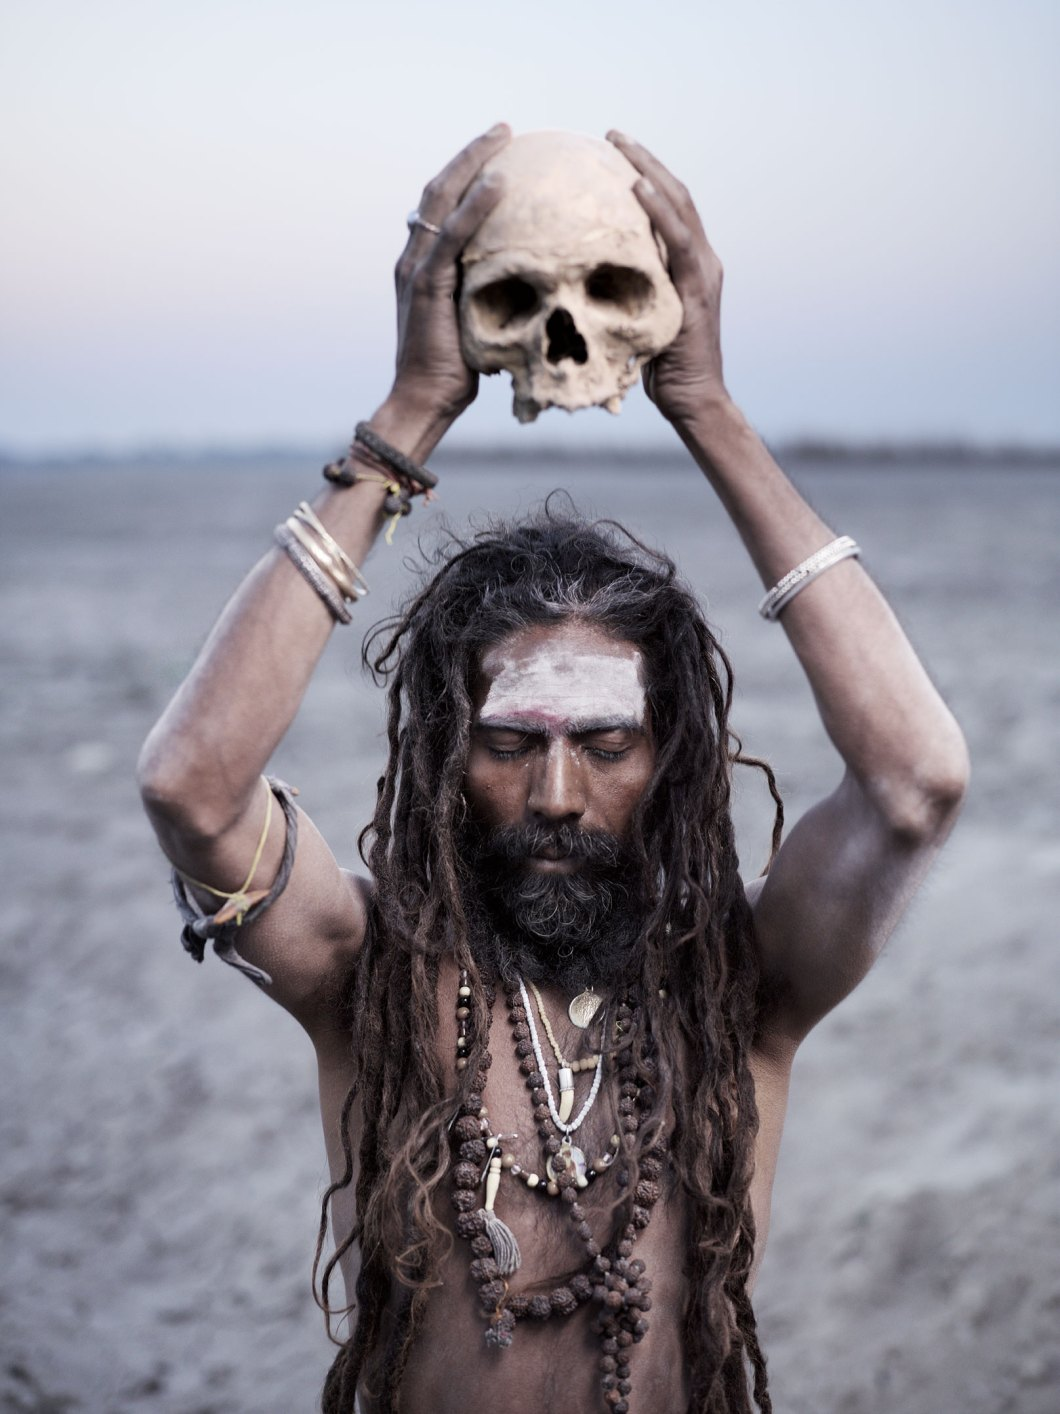 Black magic practices and necrophilia are strange ritual of Aghori sadhus in Himalayas